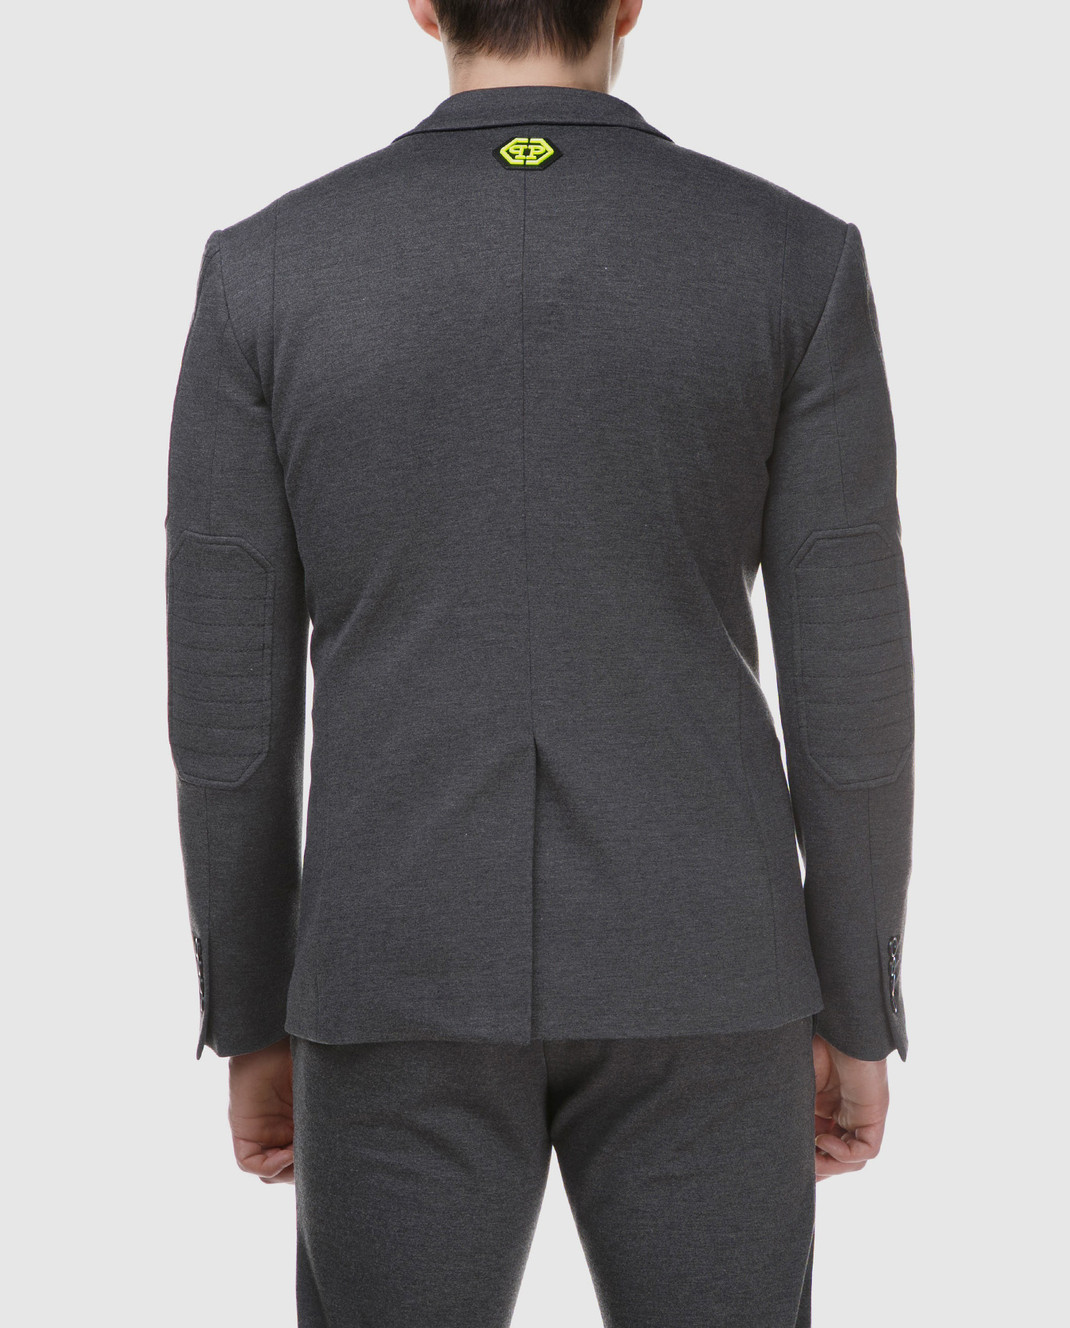 Philipp Plein Серый пиджак MRF0323 изображение 4